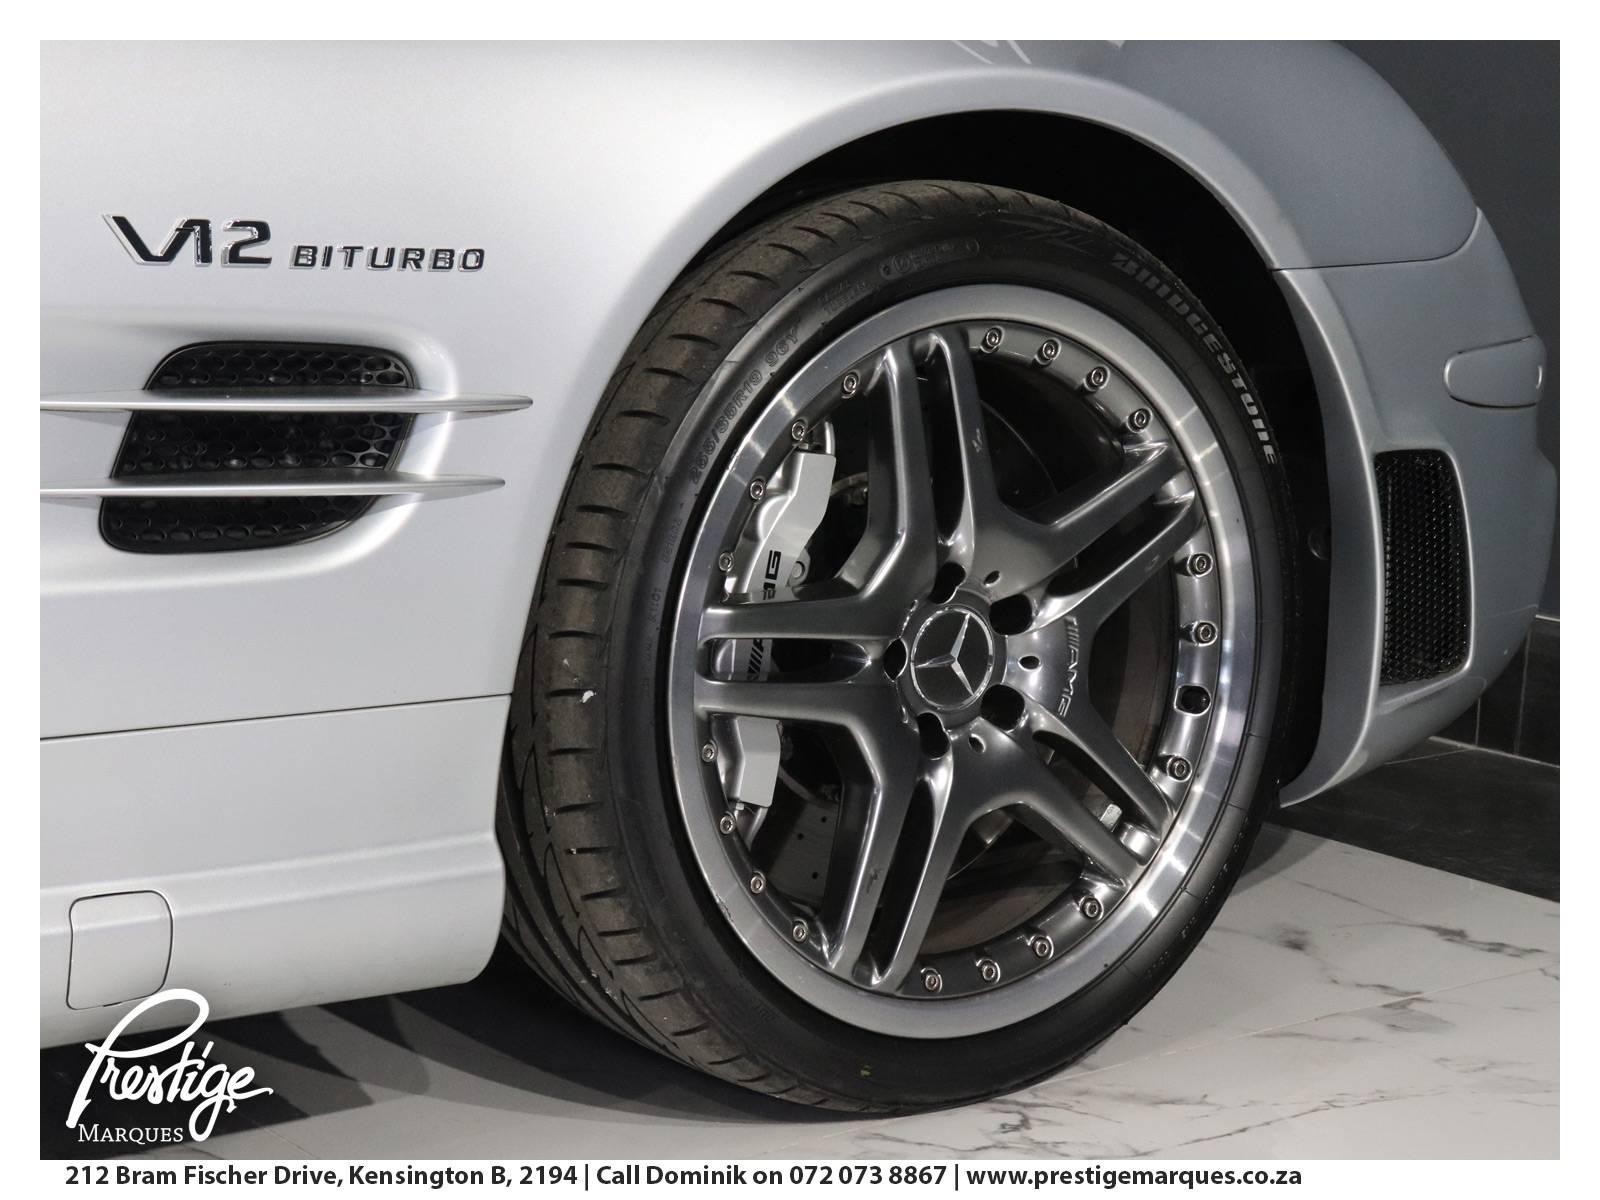 2006-Mercedes-Benz-SL65-AMG-Prestige-Marques-Randburg-Sandton-15